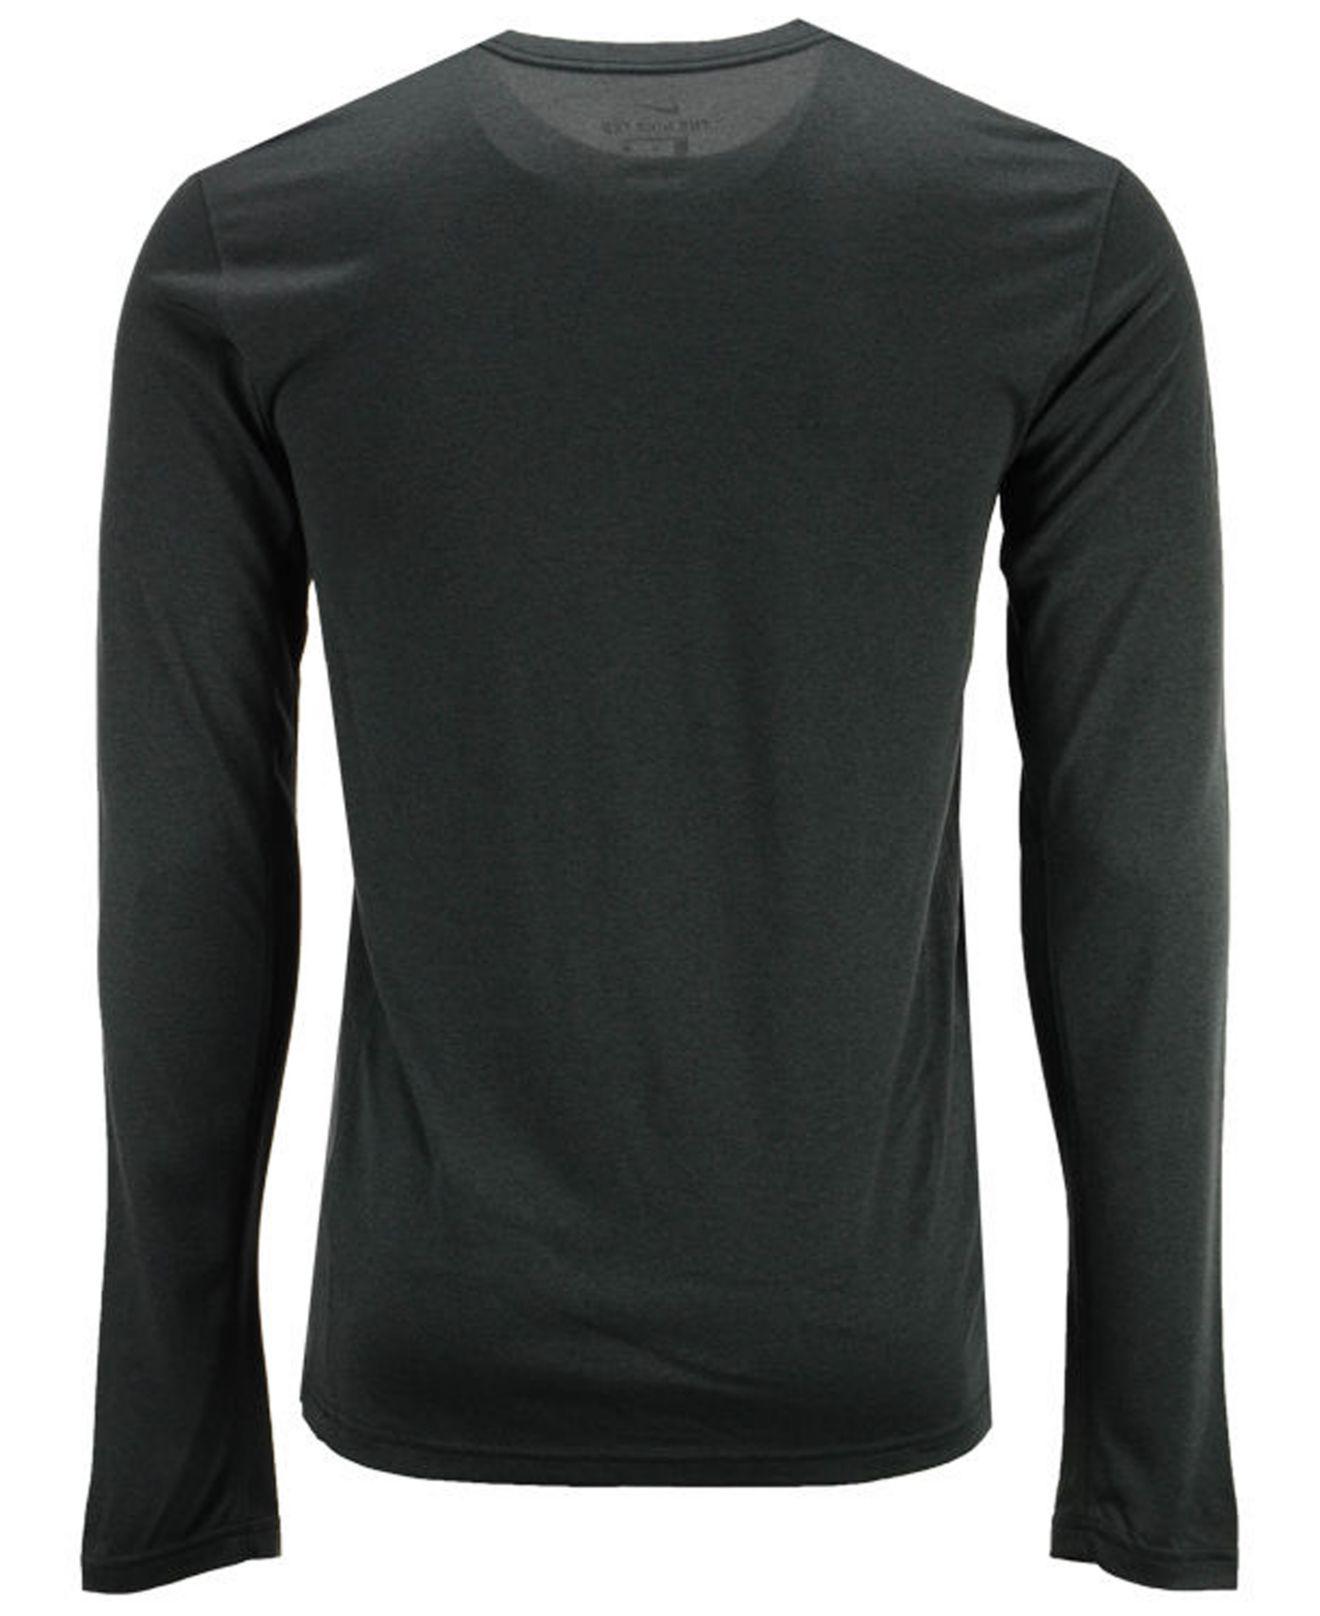 96652bc1 Lyst - Nike Men's Dri-fit Legend Wordmark Long Sleeve T-shirt in Black for  Men